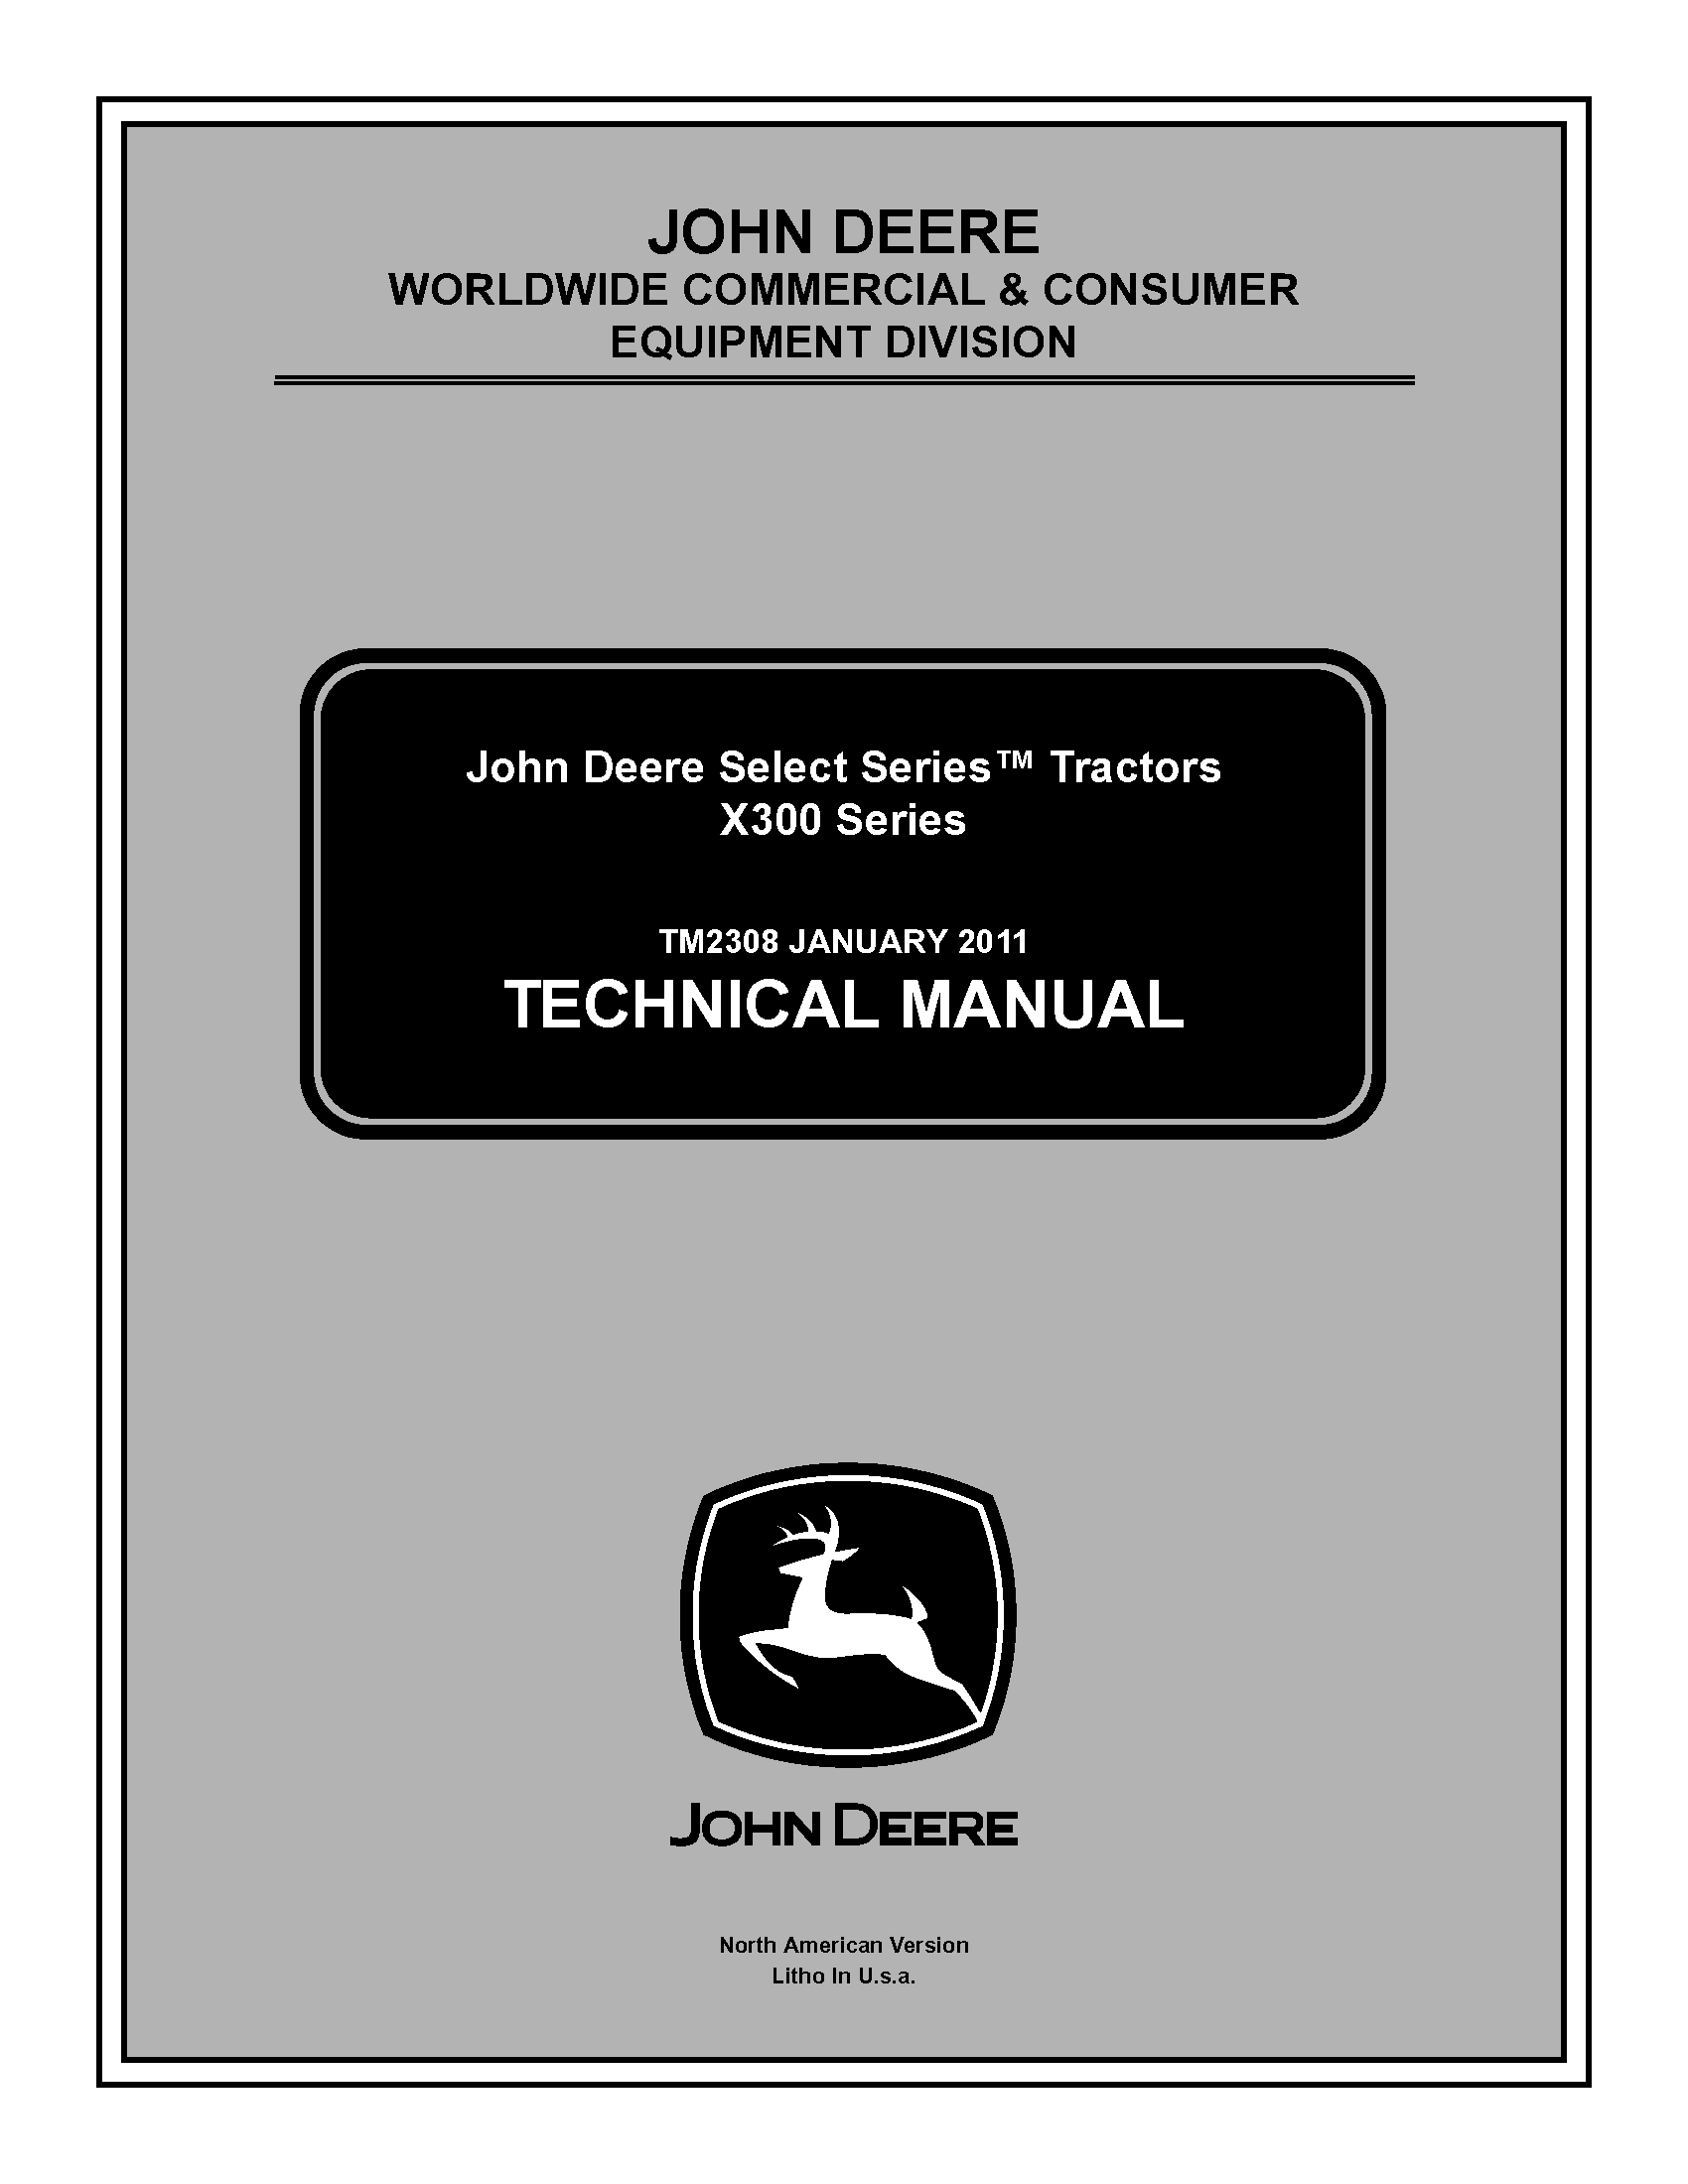 JOHN DEERE Tractors X300 X304 X320 X324 X340 X360 Repair